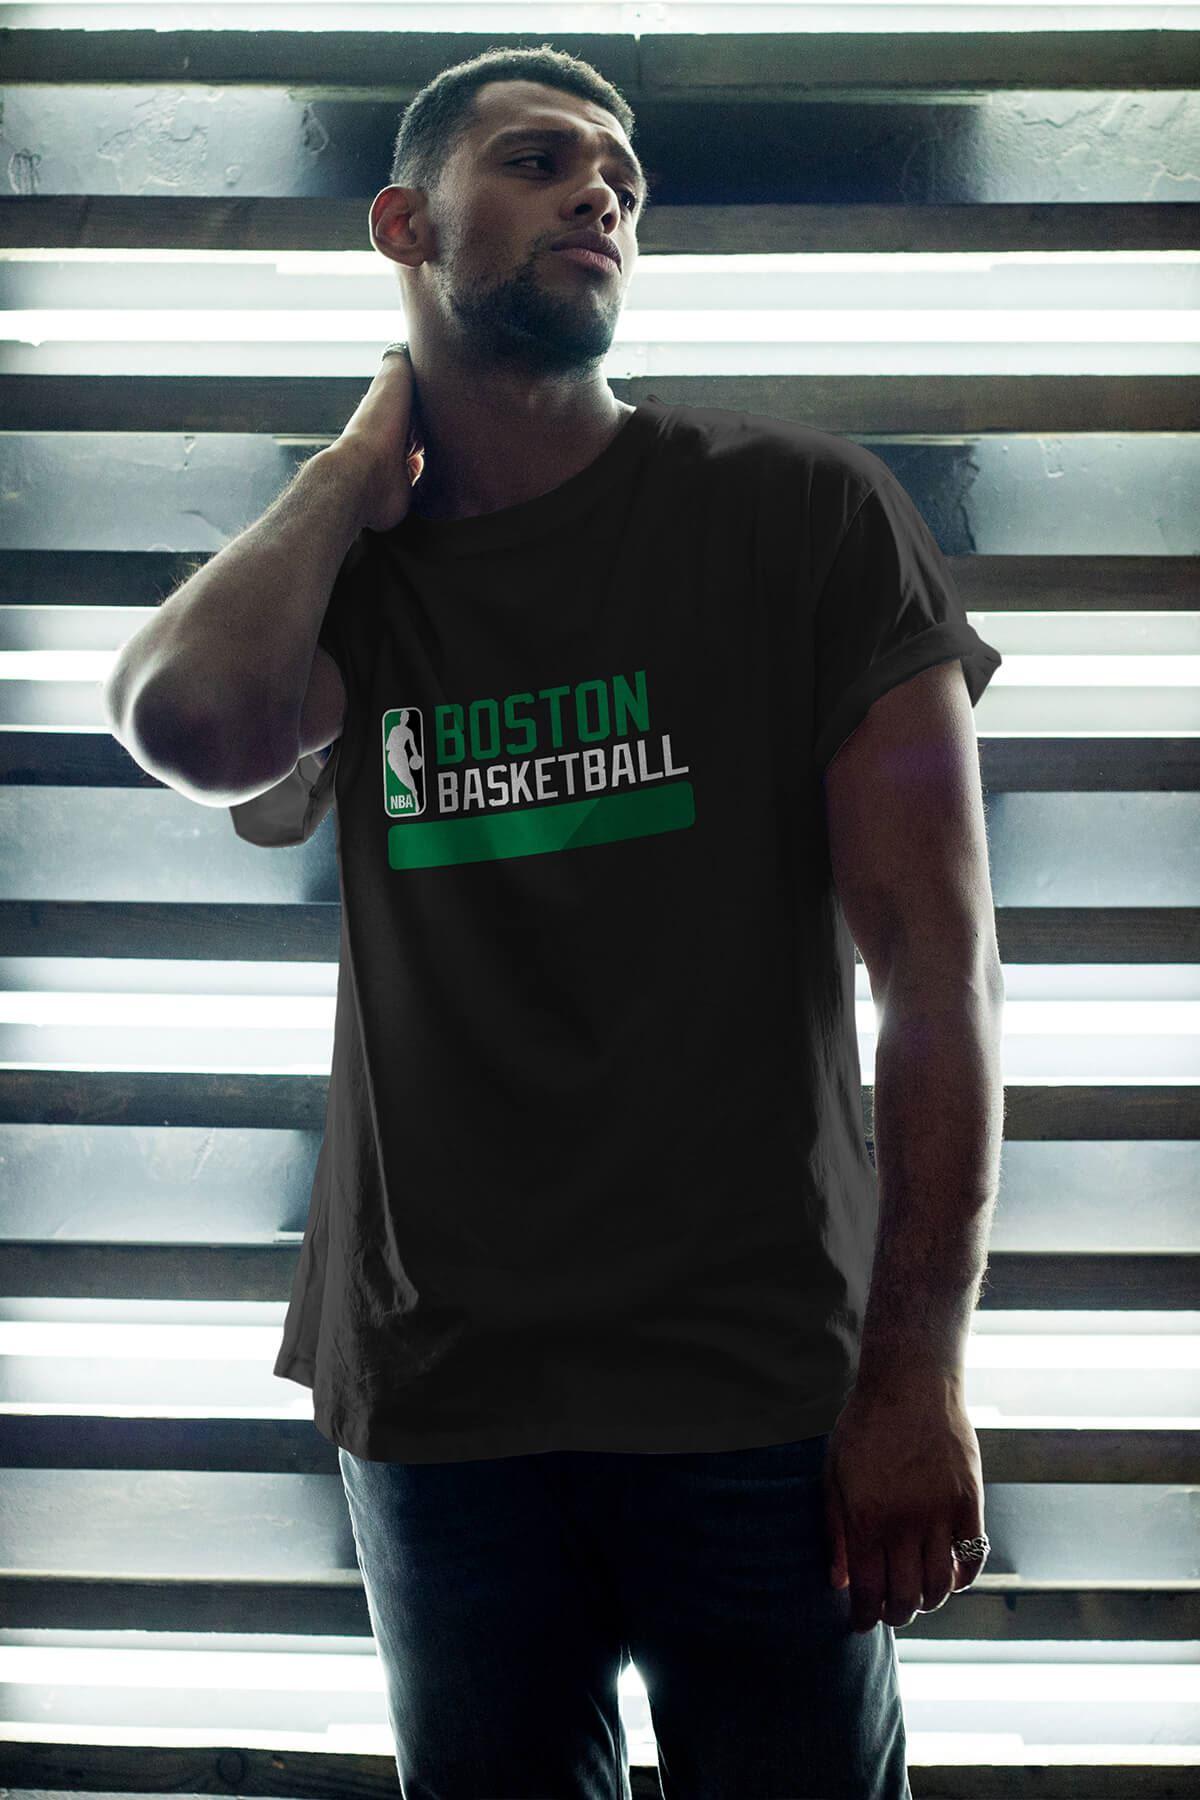 Boston Celtics 26 Siyah Erkek Oversize Tshirt - Tişört